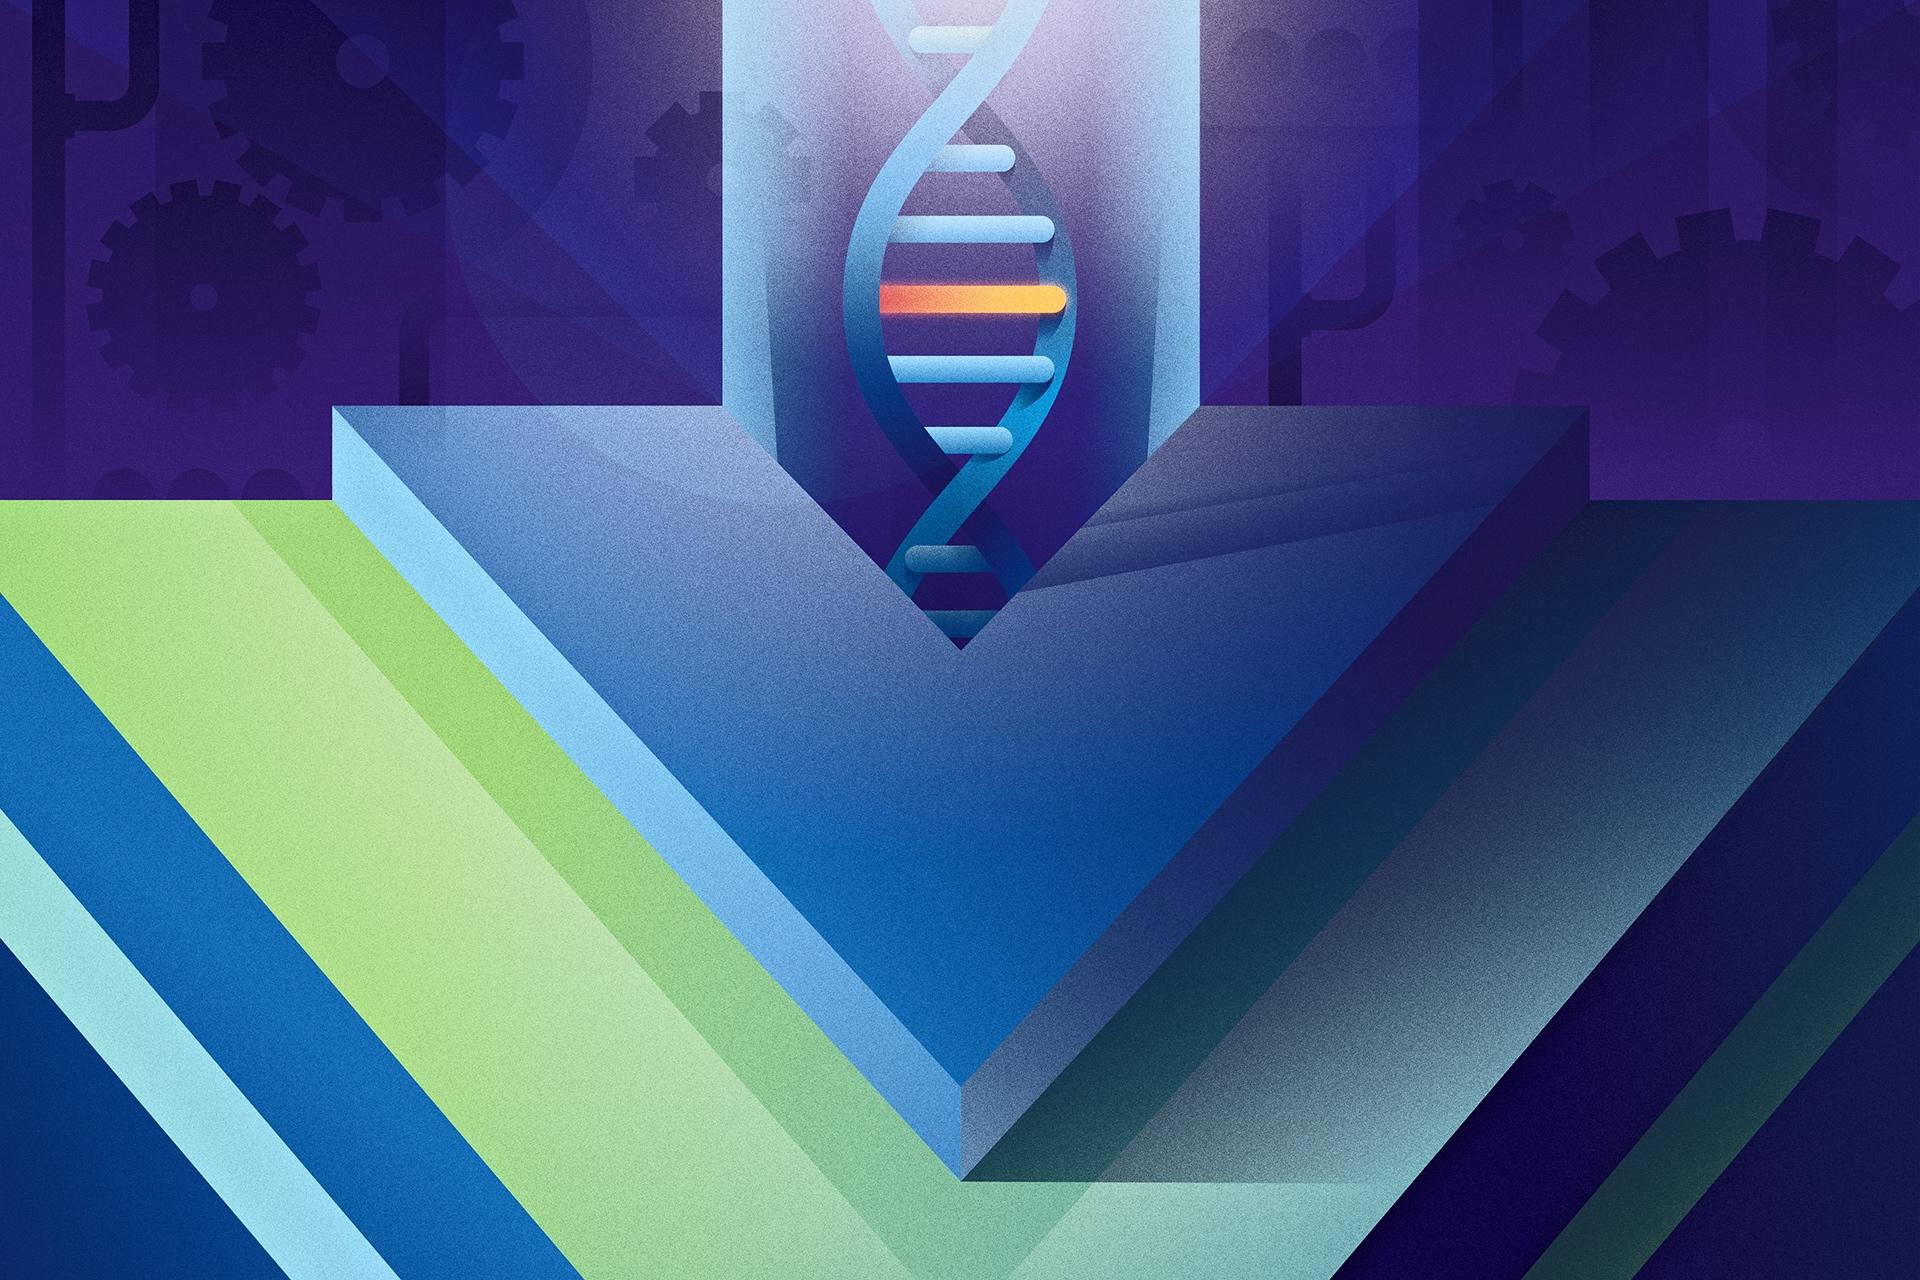 Vue Logo With DNA Strand Mutation